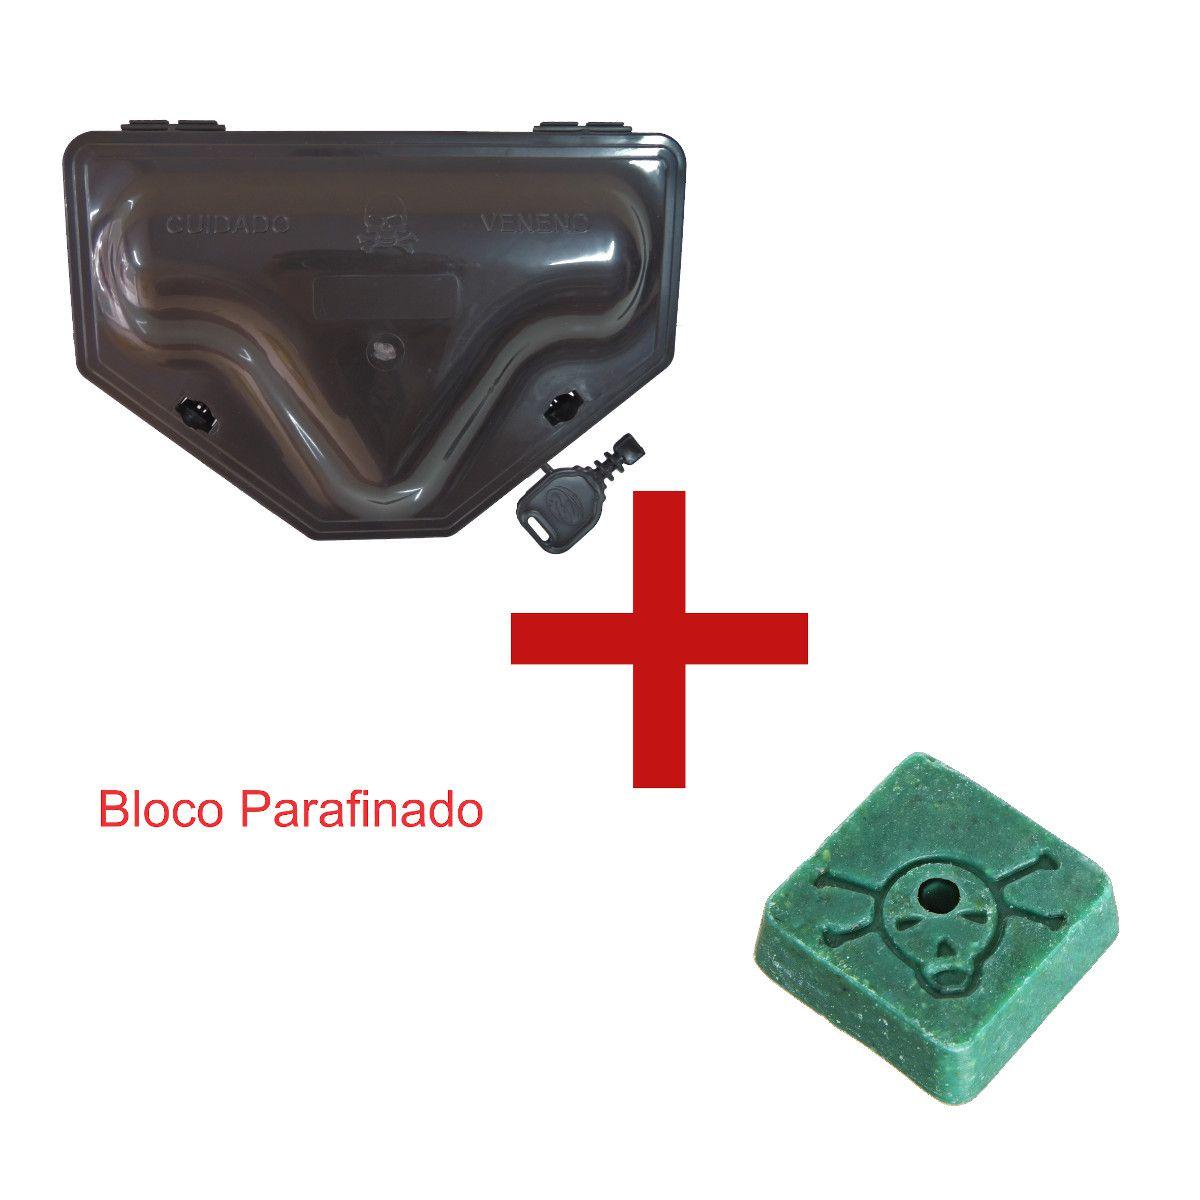 KIT 6 Porta Iscas Armadilha Pega Ratos 2 TRAVAS c/ Chave